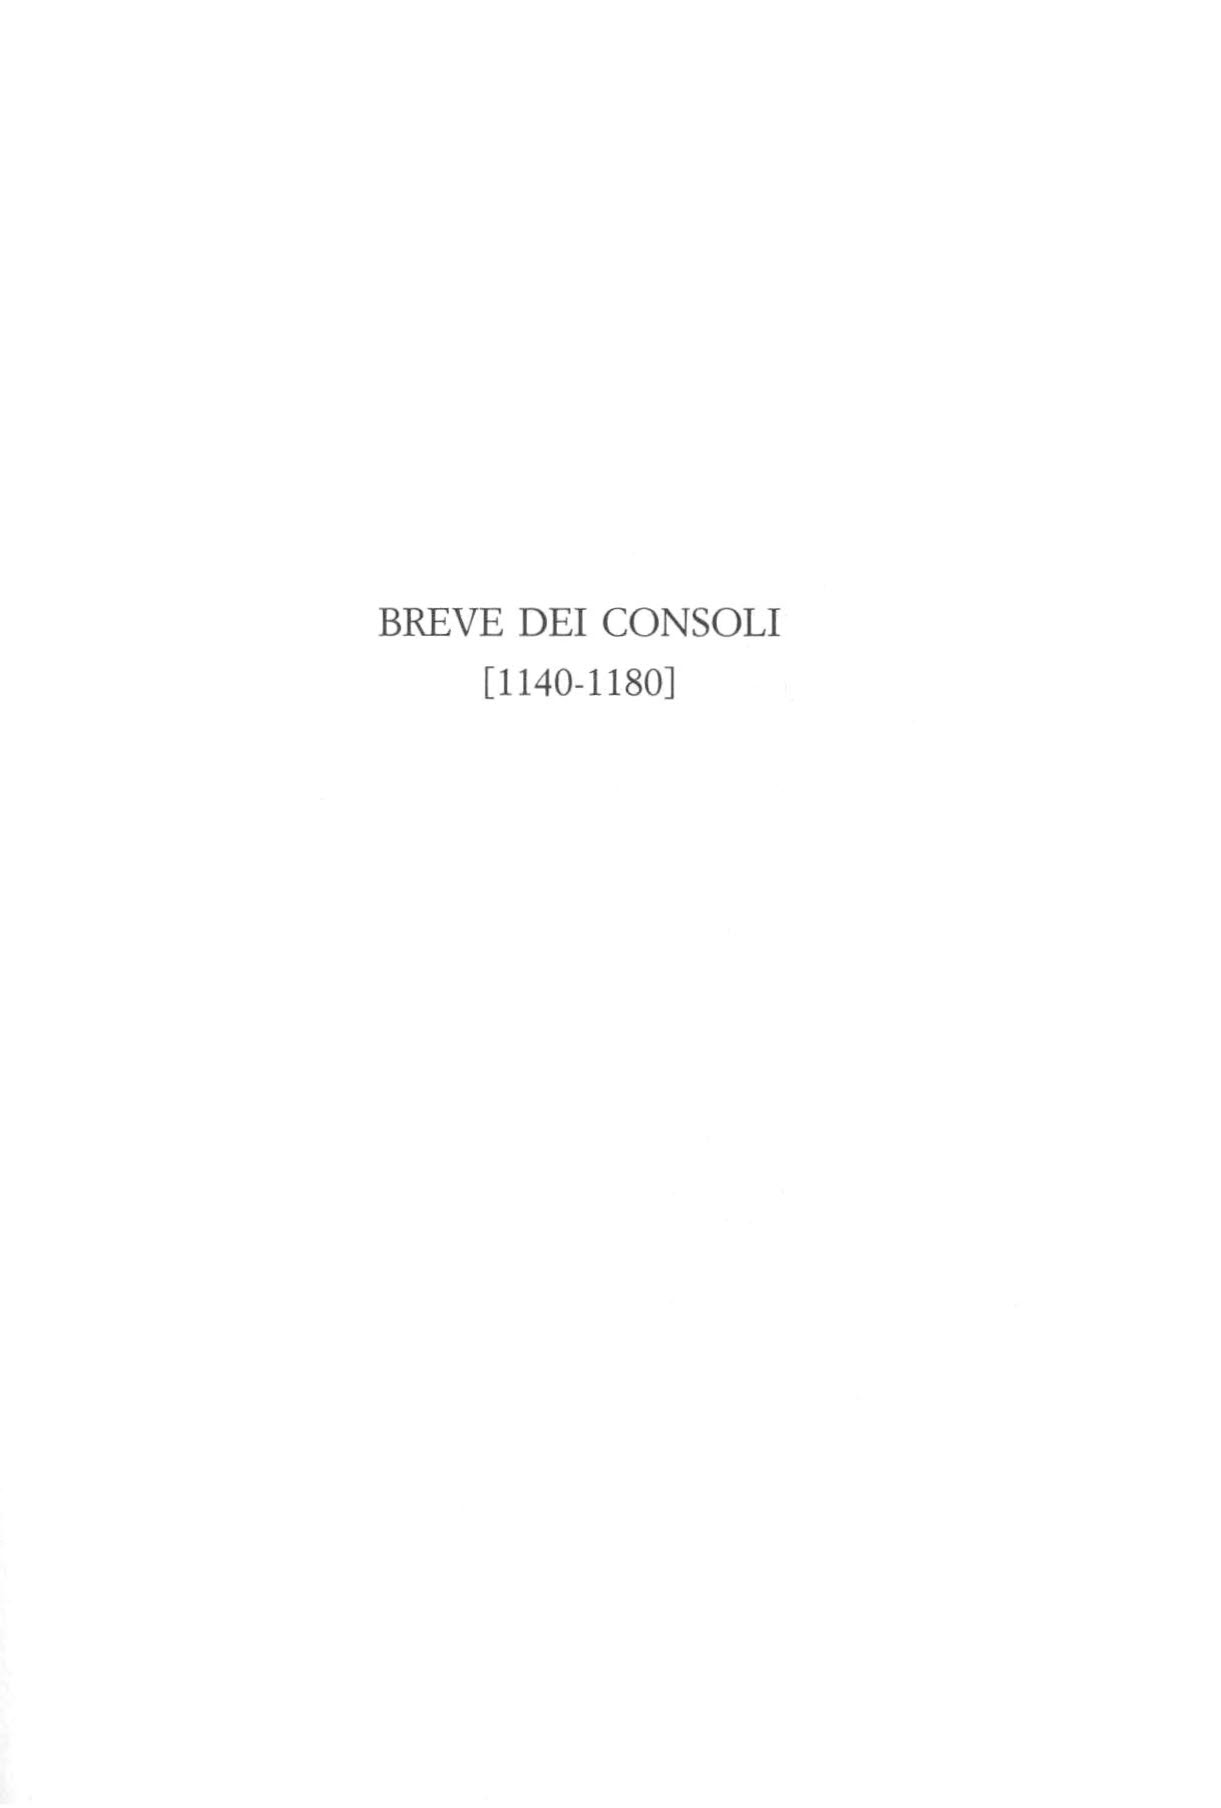 statuti pistoiesi del sec.XII 0129.jpg